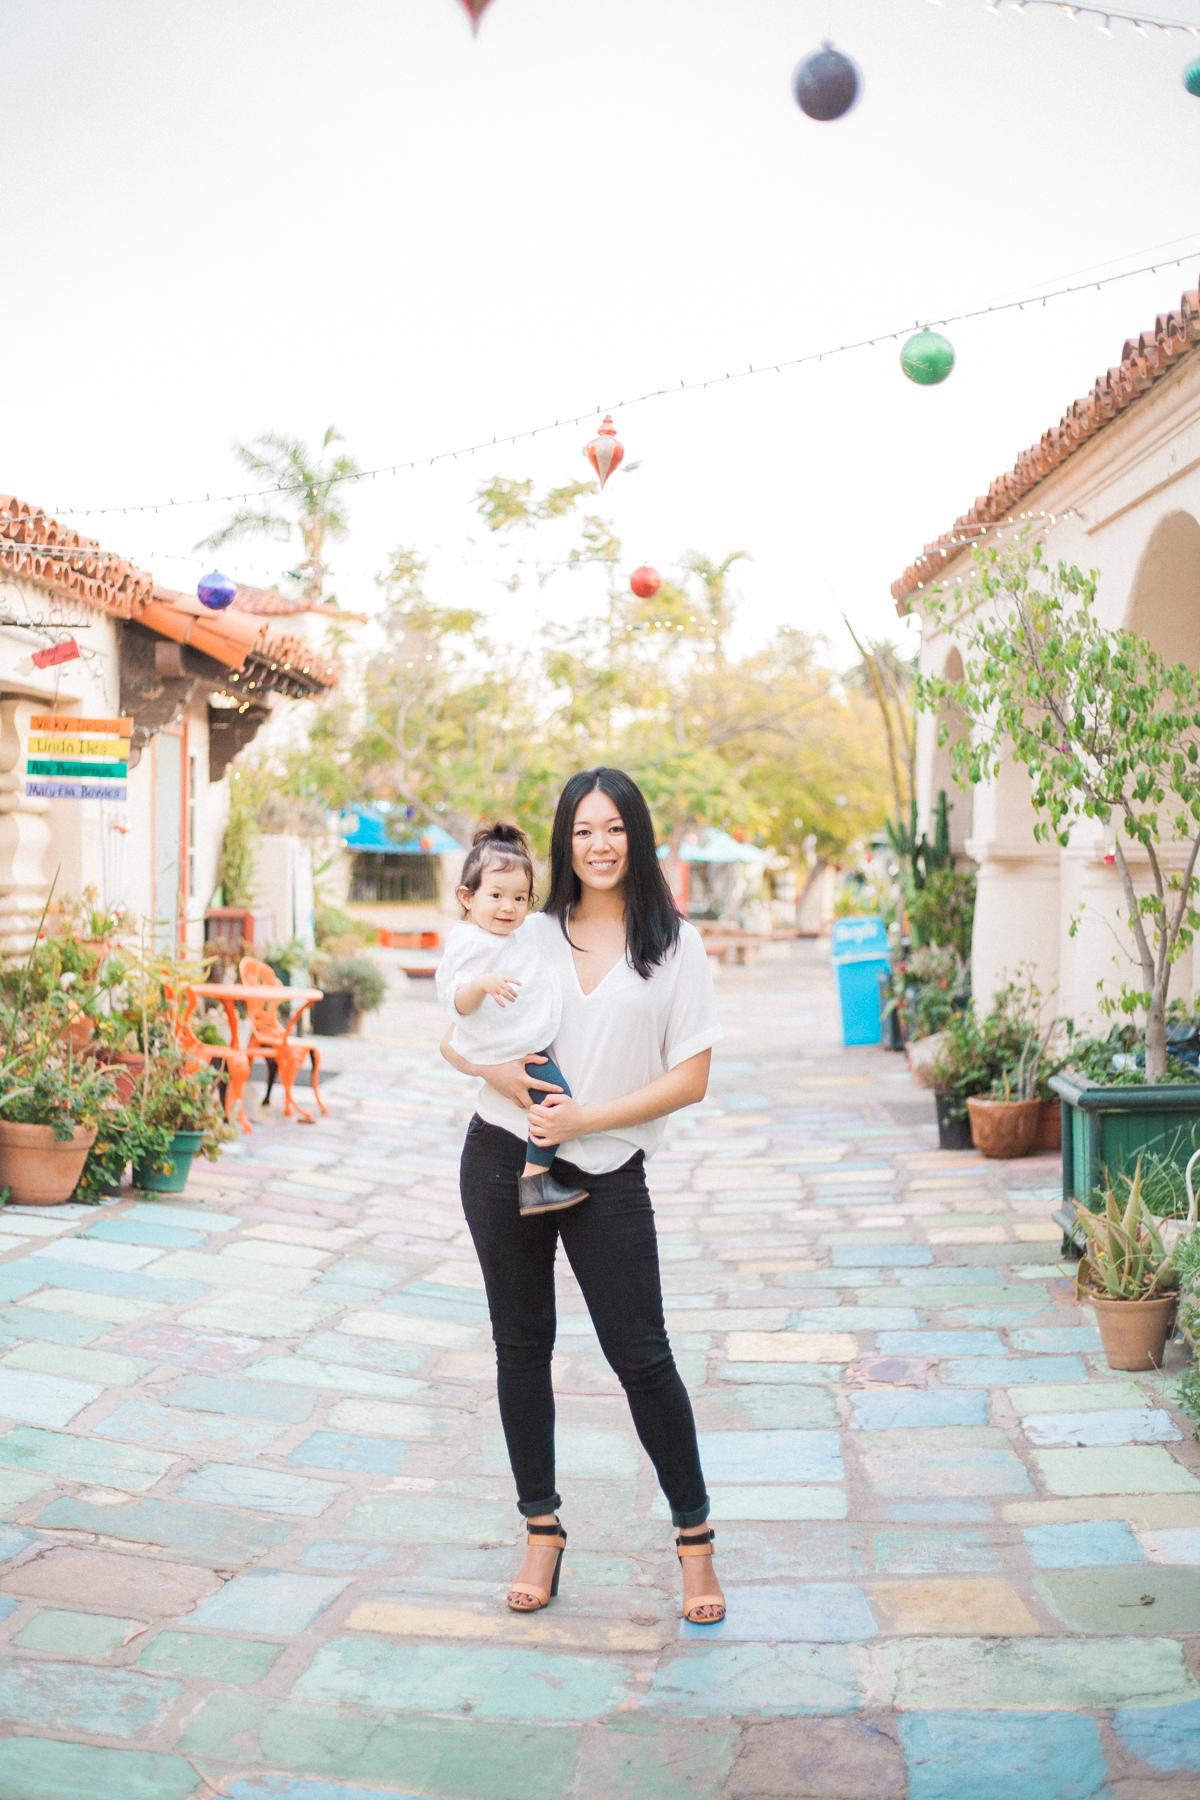 spanish-art-village-balboa-park-photos-10.jpg